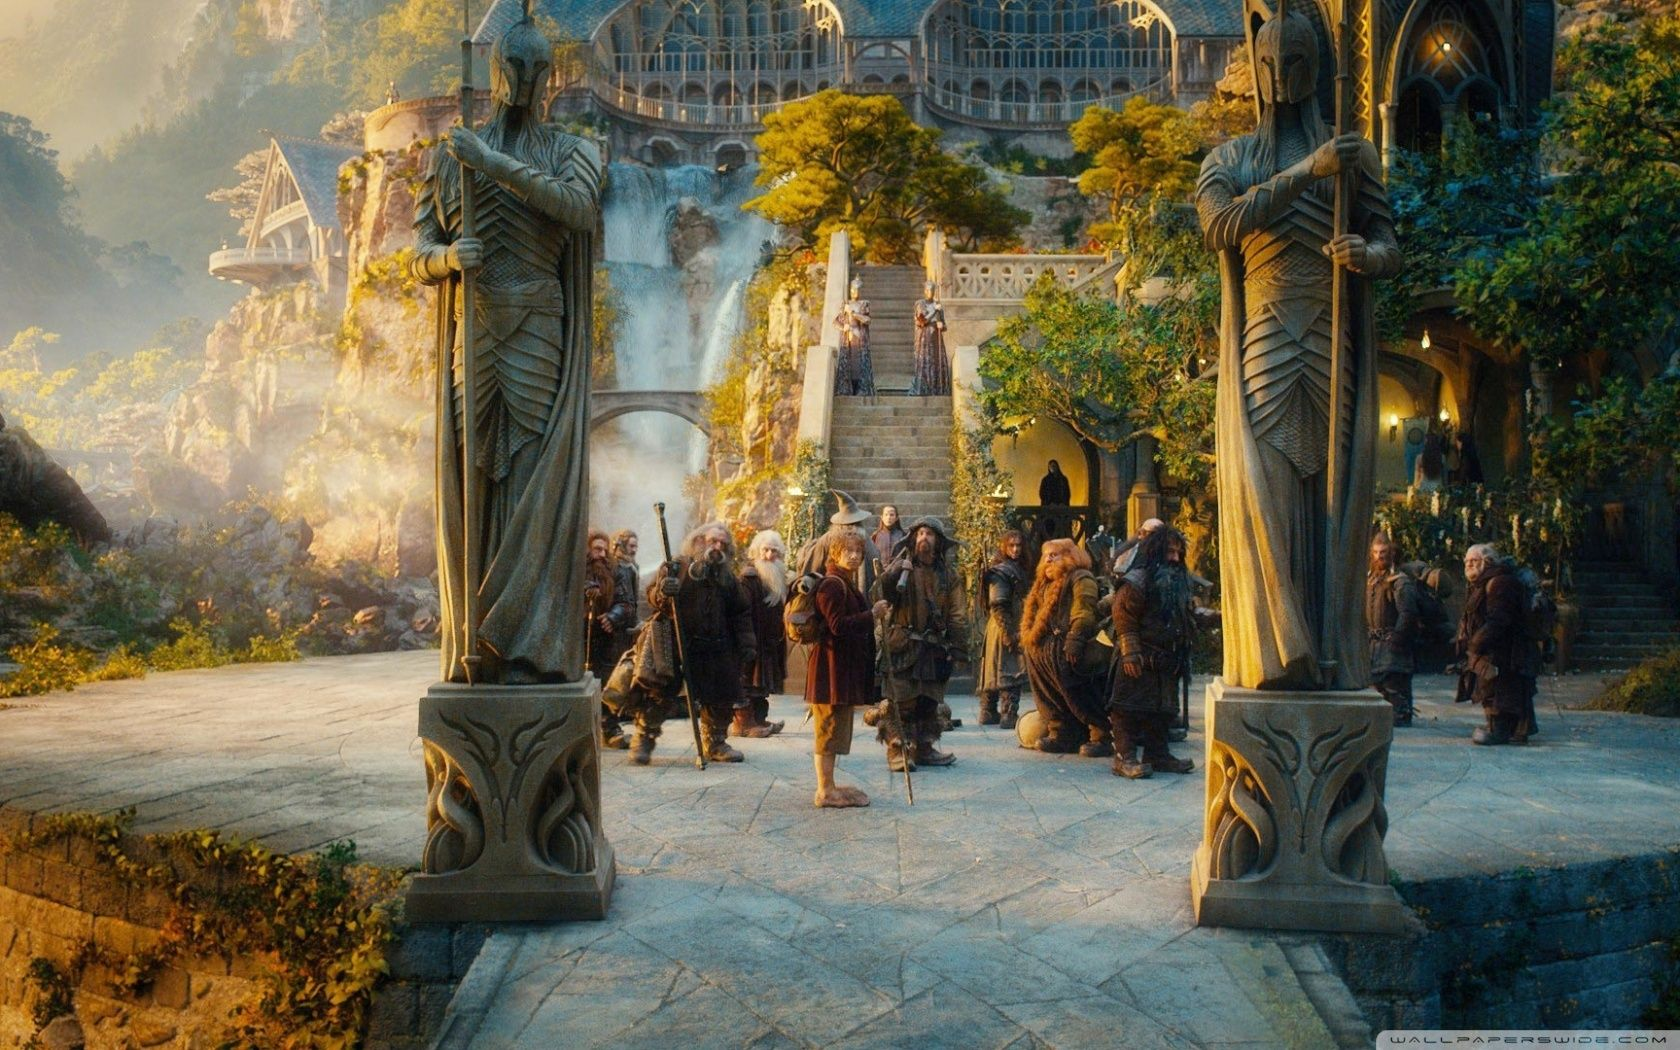 The Hobbit An Unexpected Journey Wallpaper Desktop Hobbit An Unexpected Journey An Unexpected Journey The Hobbit